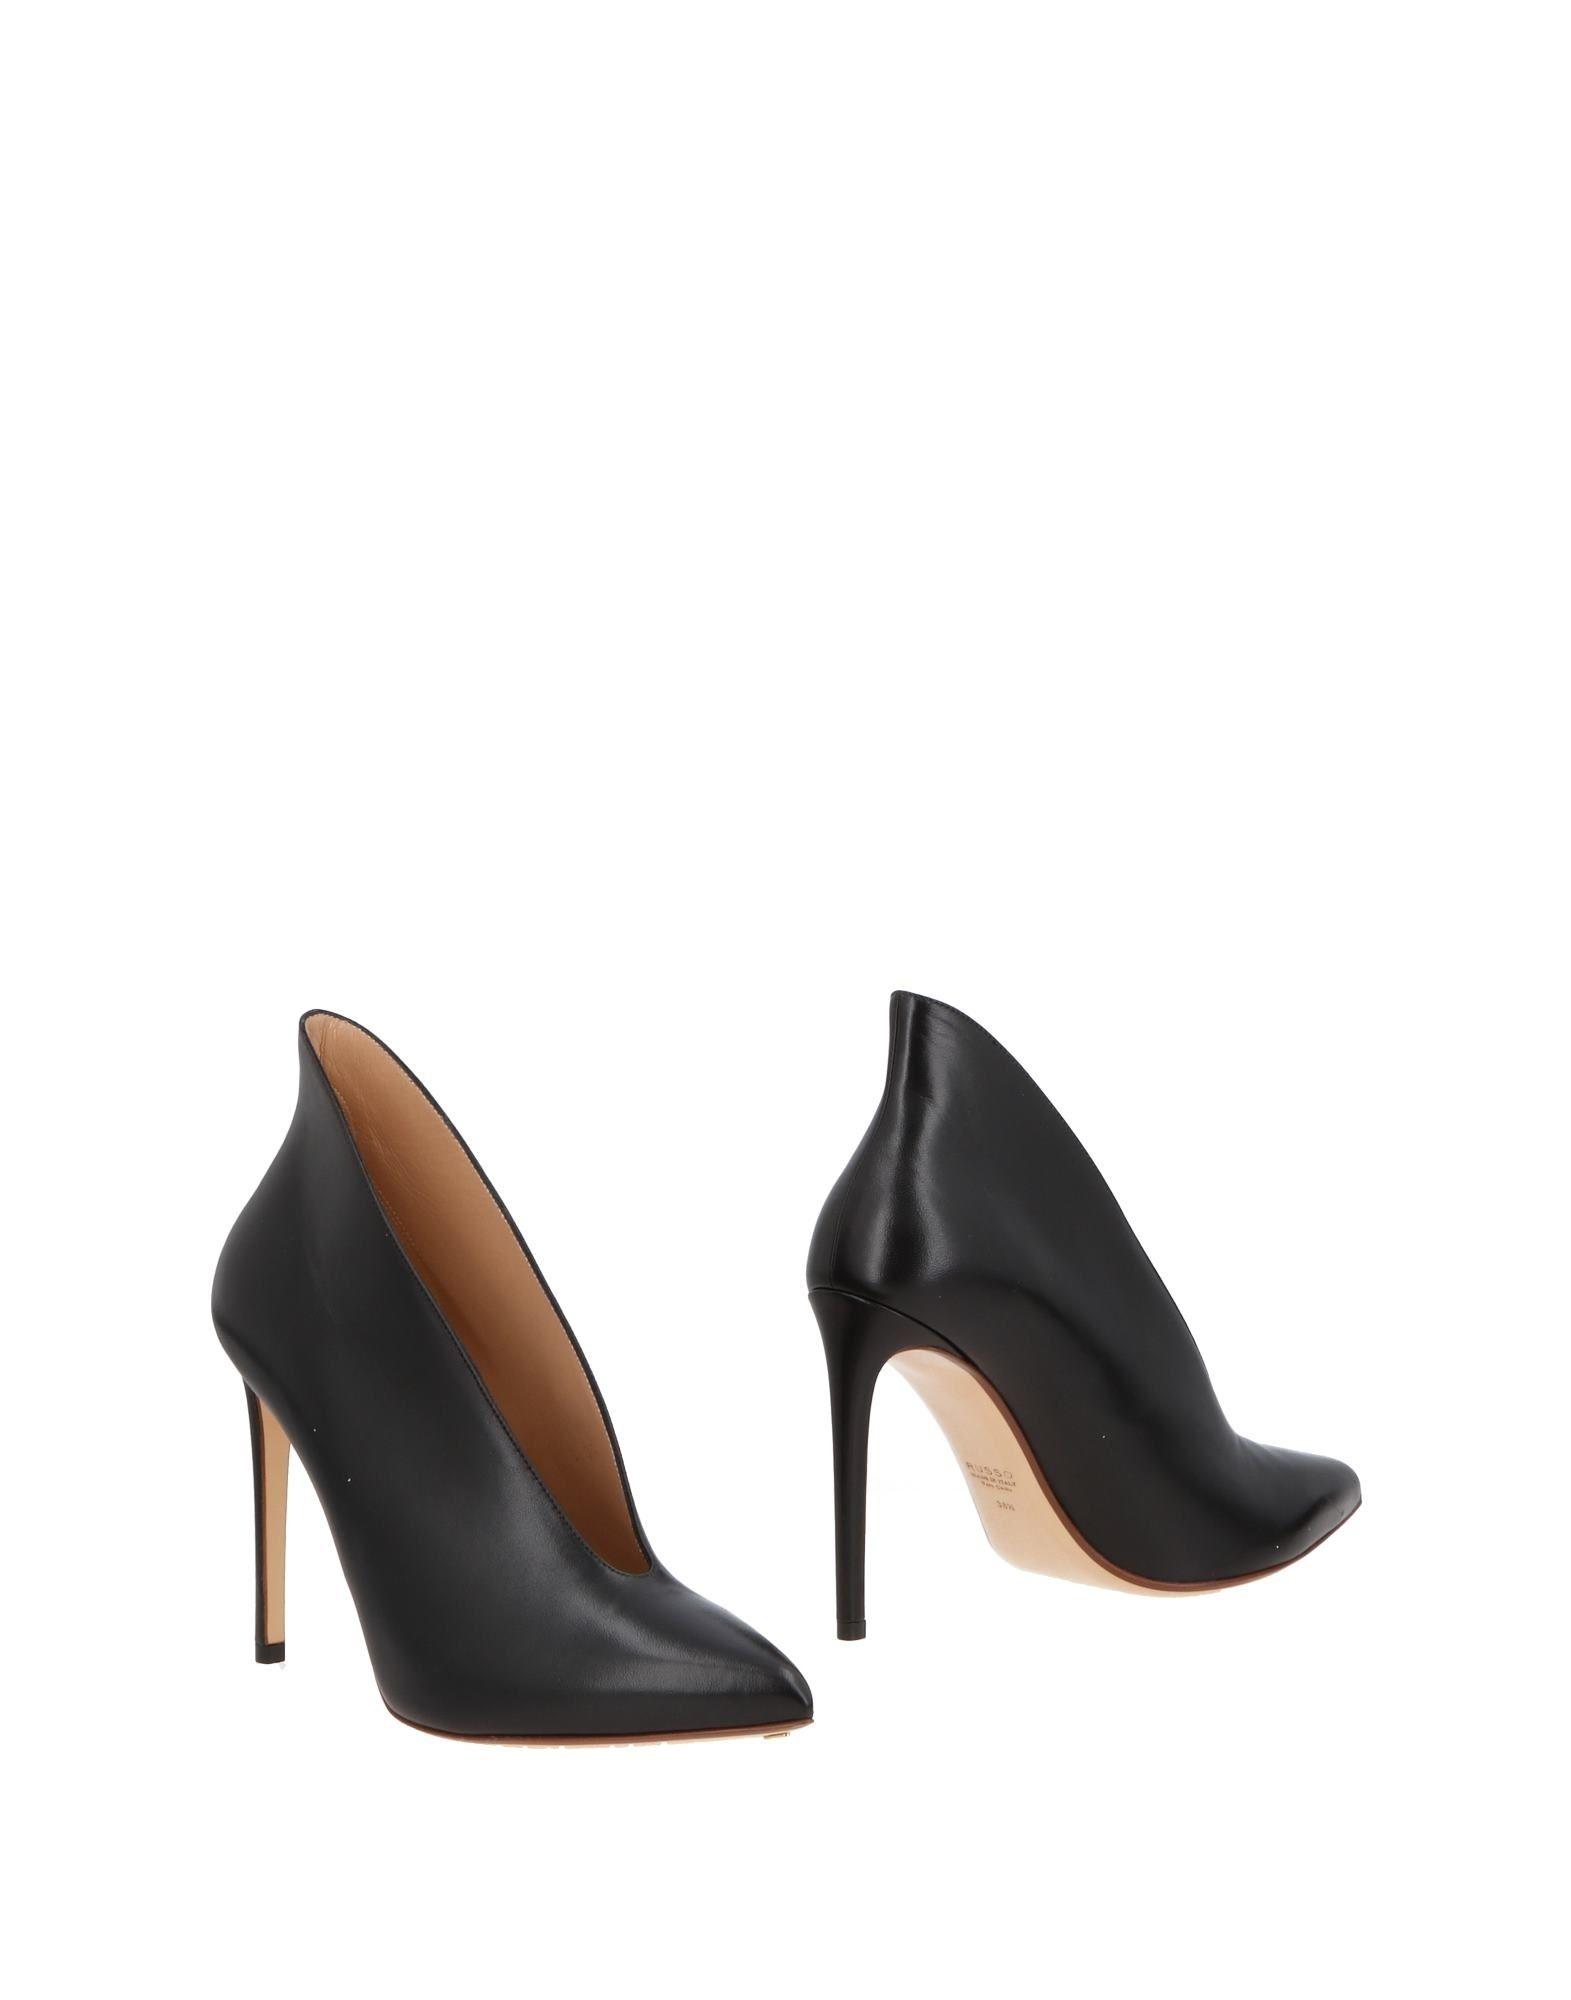 Francesco Russo gut Stiefelette Damen  11500482CIGünstige gut Russo aussehende Schuhe 54be4e